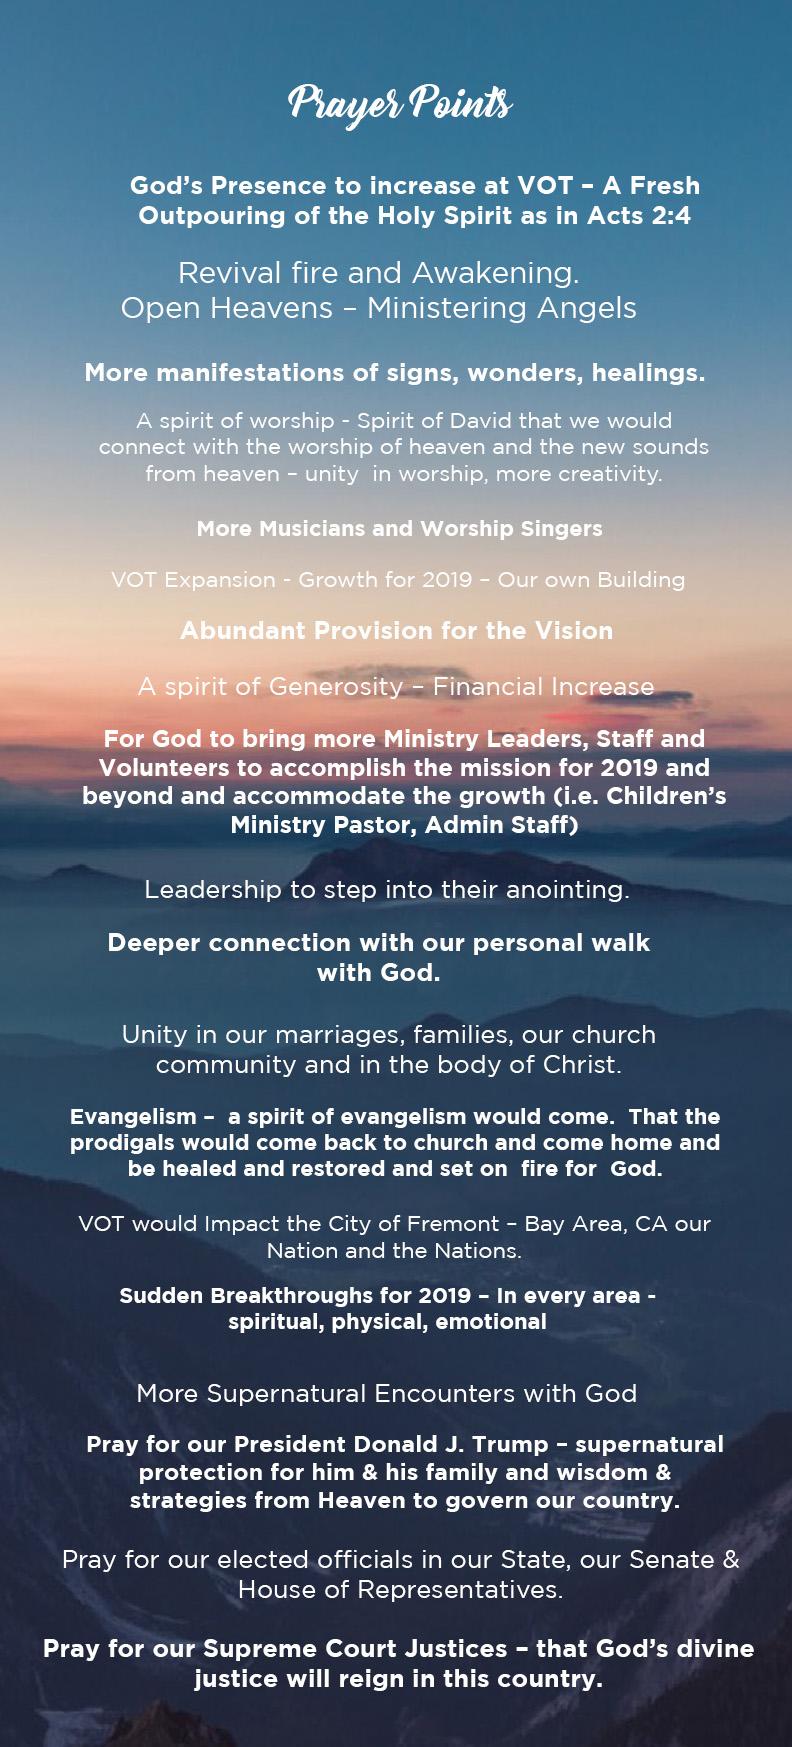 PrayerpointsLONGEST2.jpg